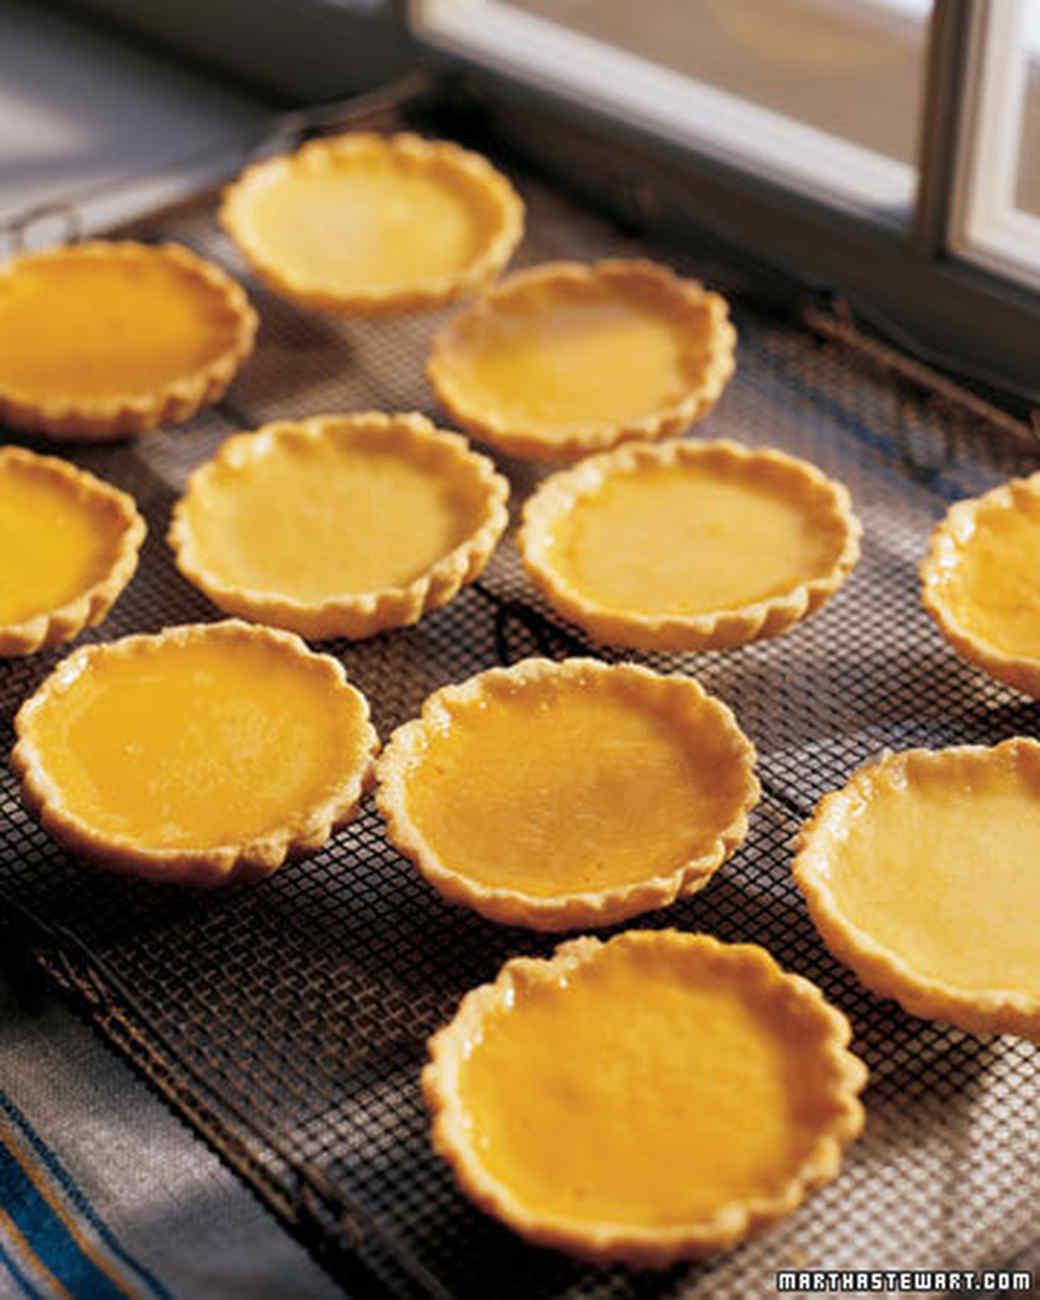 No Turkey! Food Editor Shira Bocar's Thanksgiving Menu